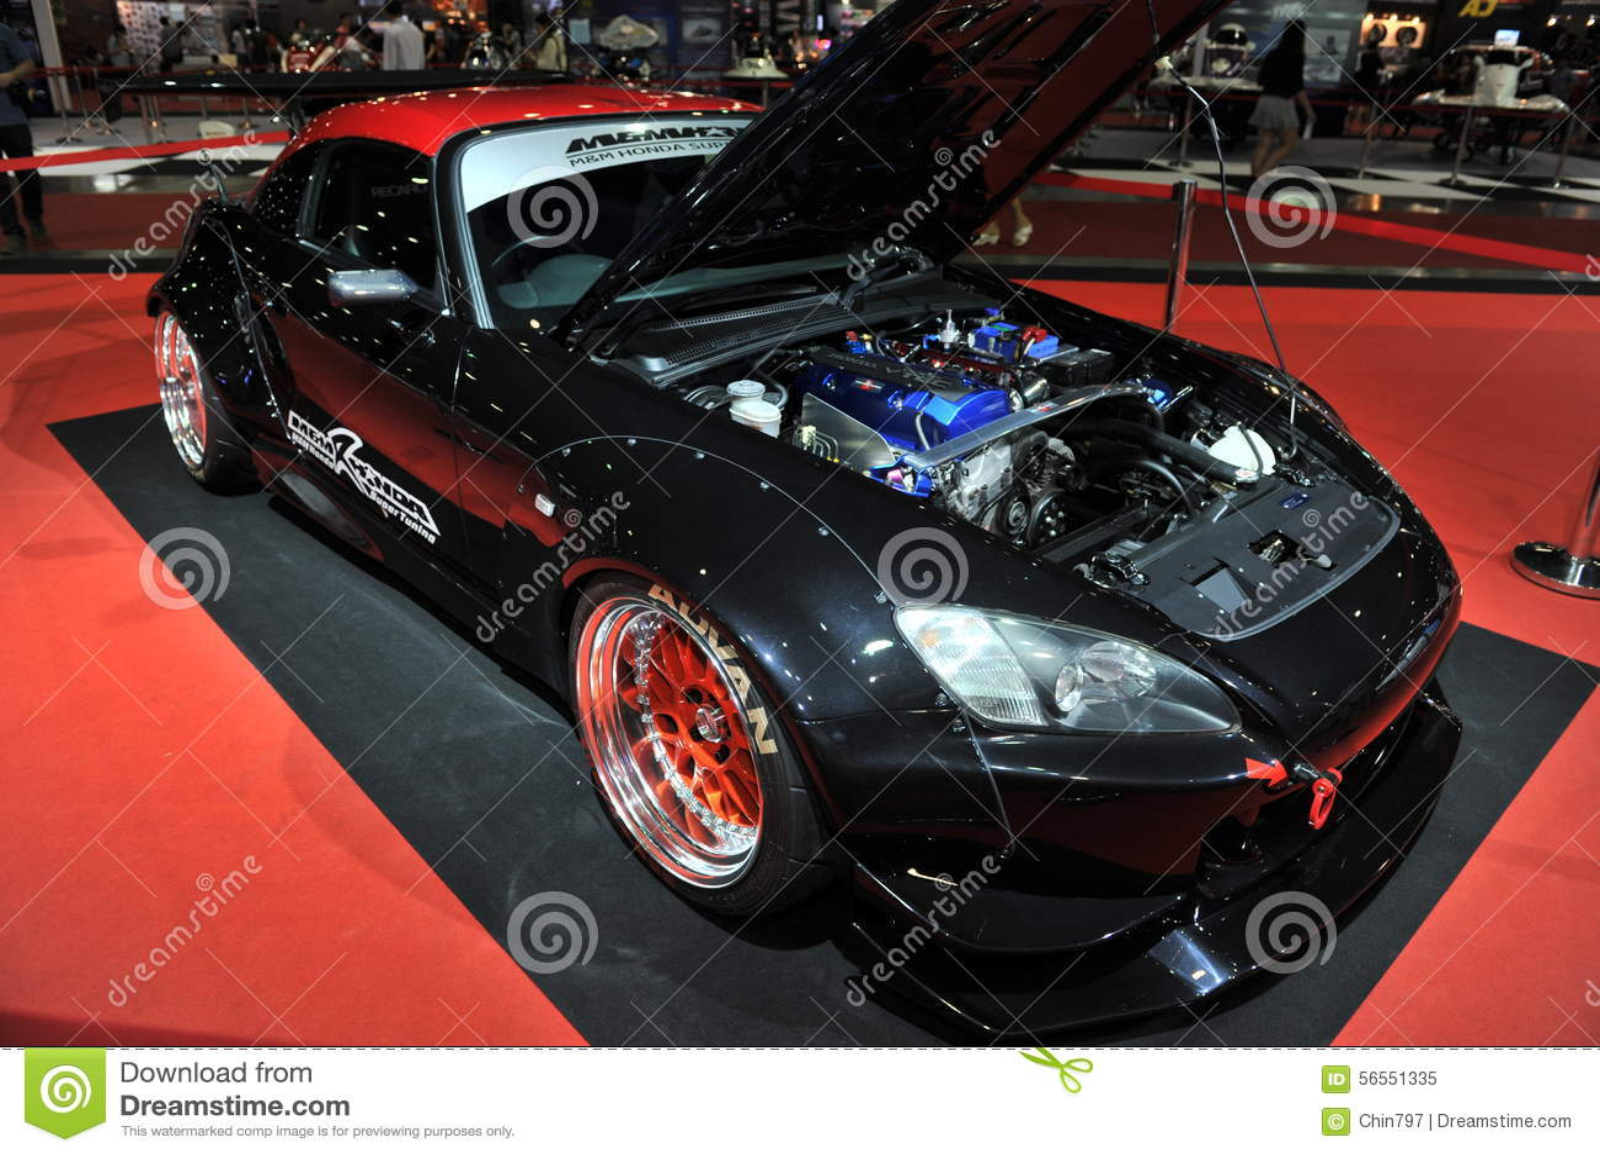 Download Αυτοκίνητο της Honda στο 3$ο διεθνές Autosalon 2015 της Μπανγκόκ στις 27 Ιουνίου 2015 στη Μπανγκόκ, Ταϊλάνδη Εκδοτική εικόνα - εικόνα από παρουσίαση, μοντέλο: 56551335